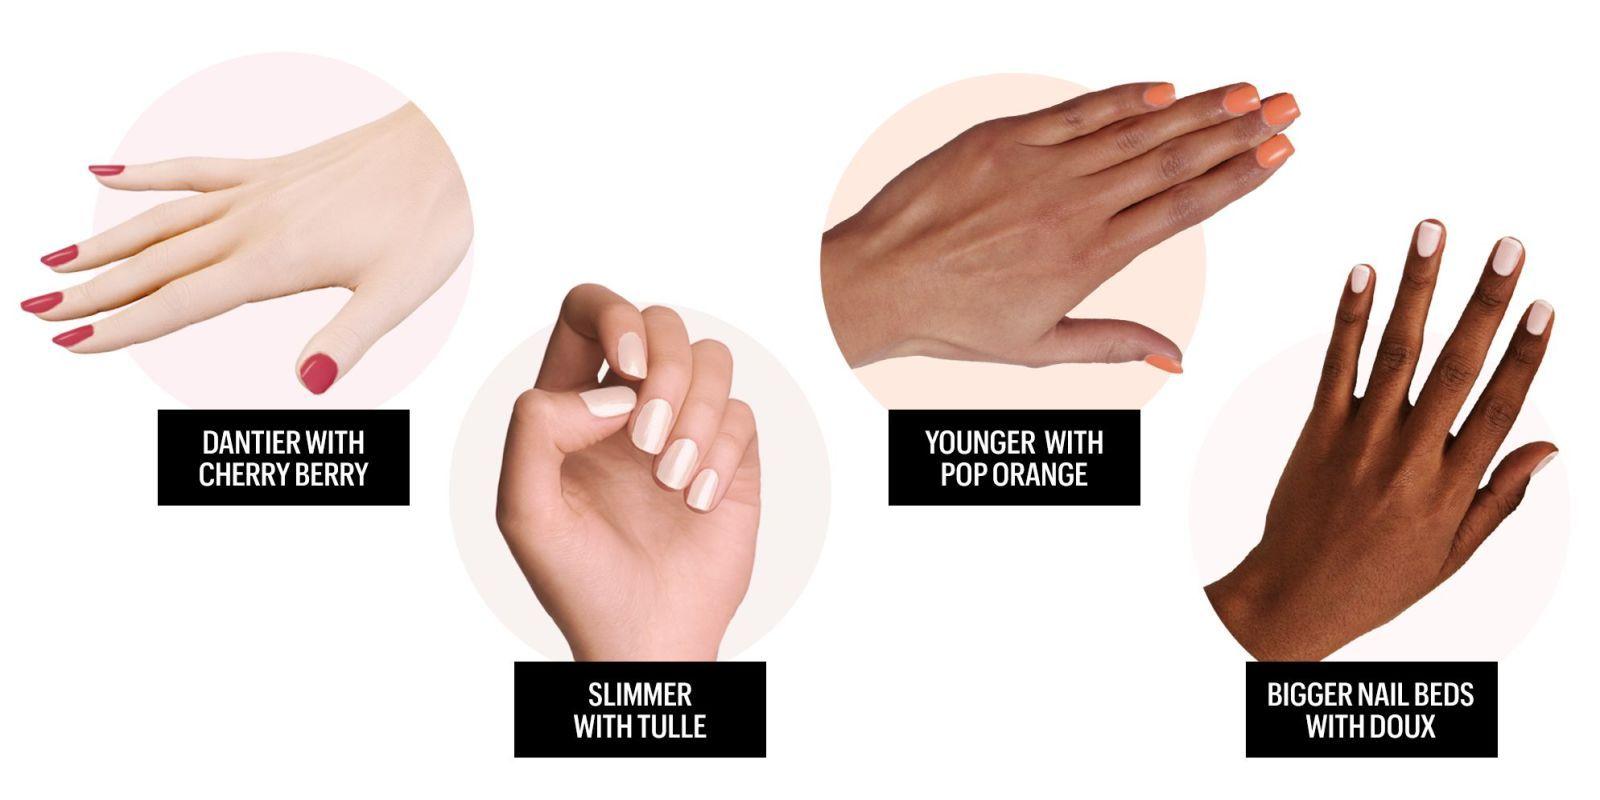 Nail Polish Colors For Dark Skin - Worksheet & Coloring Pages